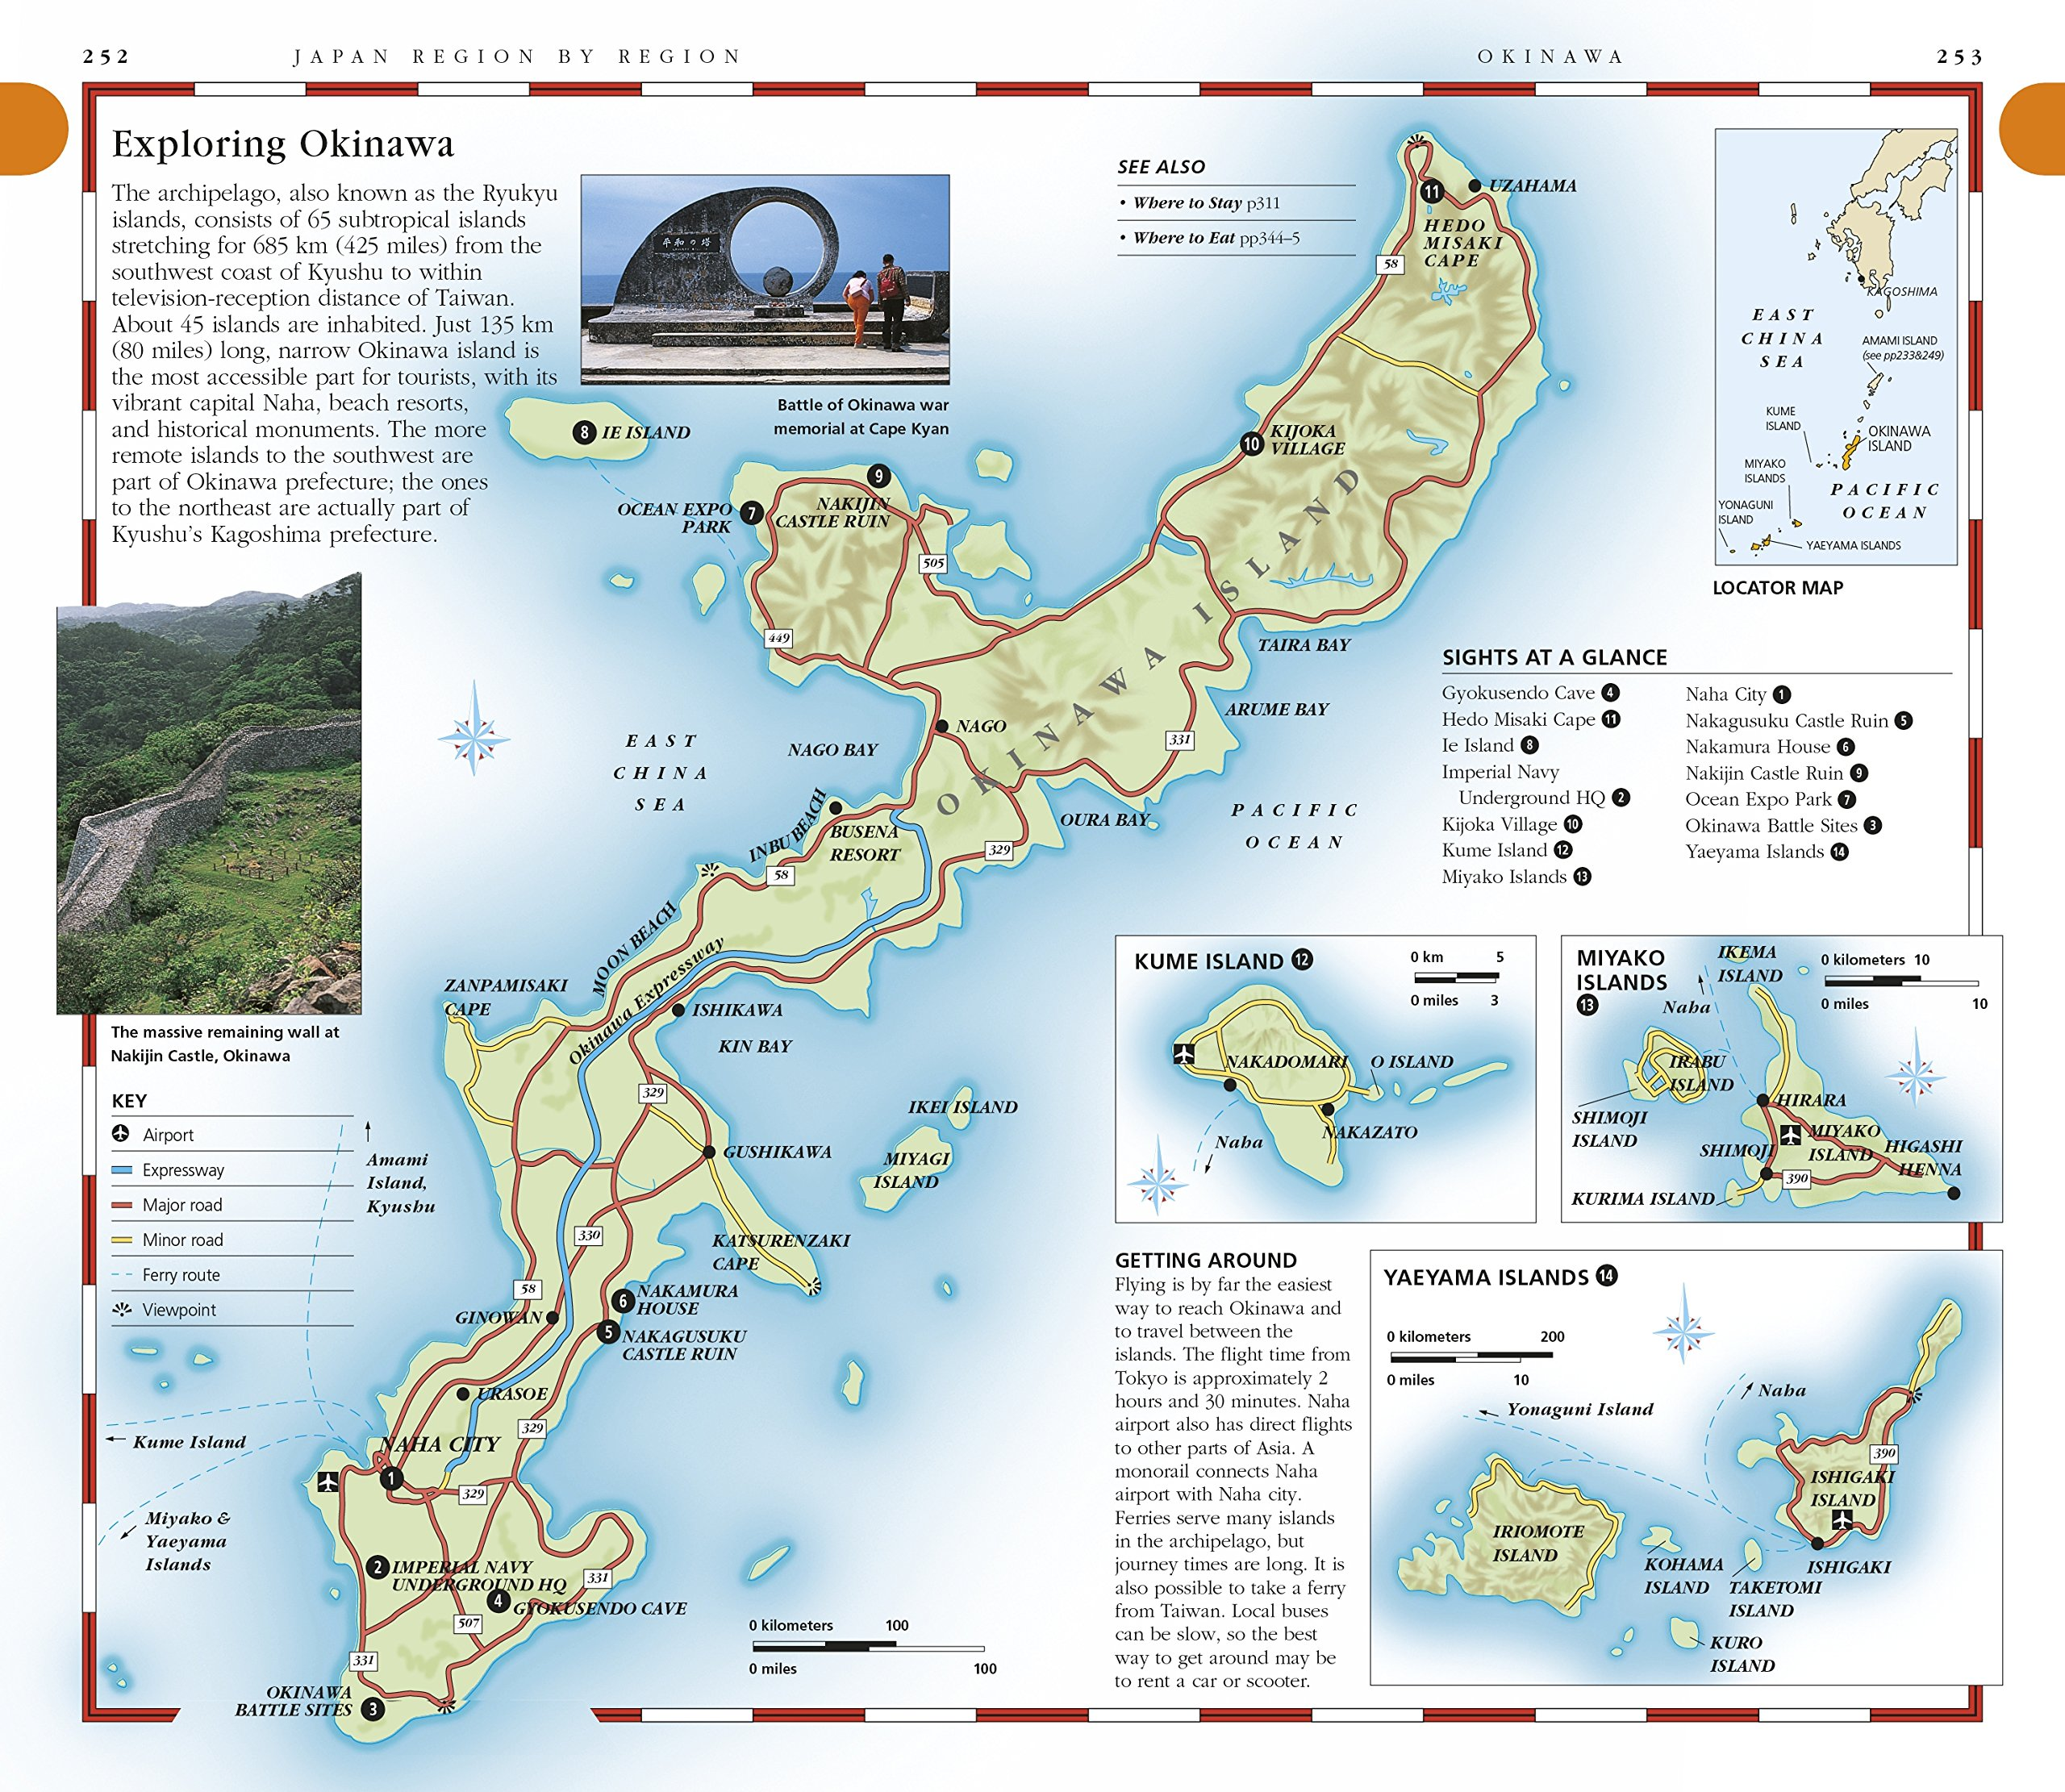 DK Eyewitness Travel Guide Japan John Benson - Japan map travel guide